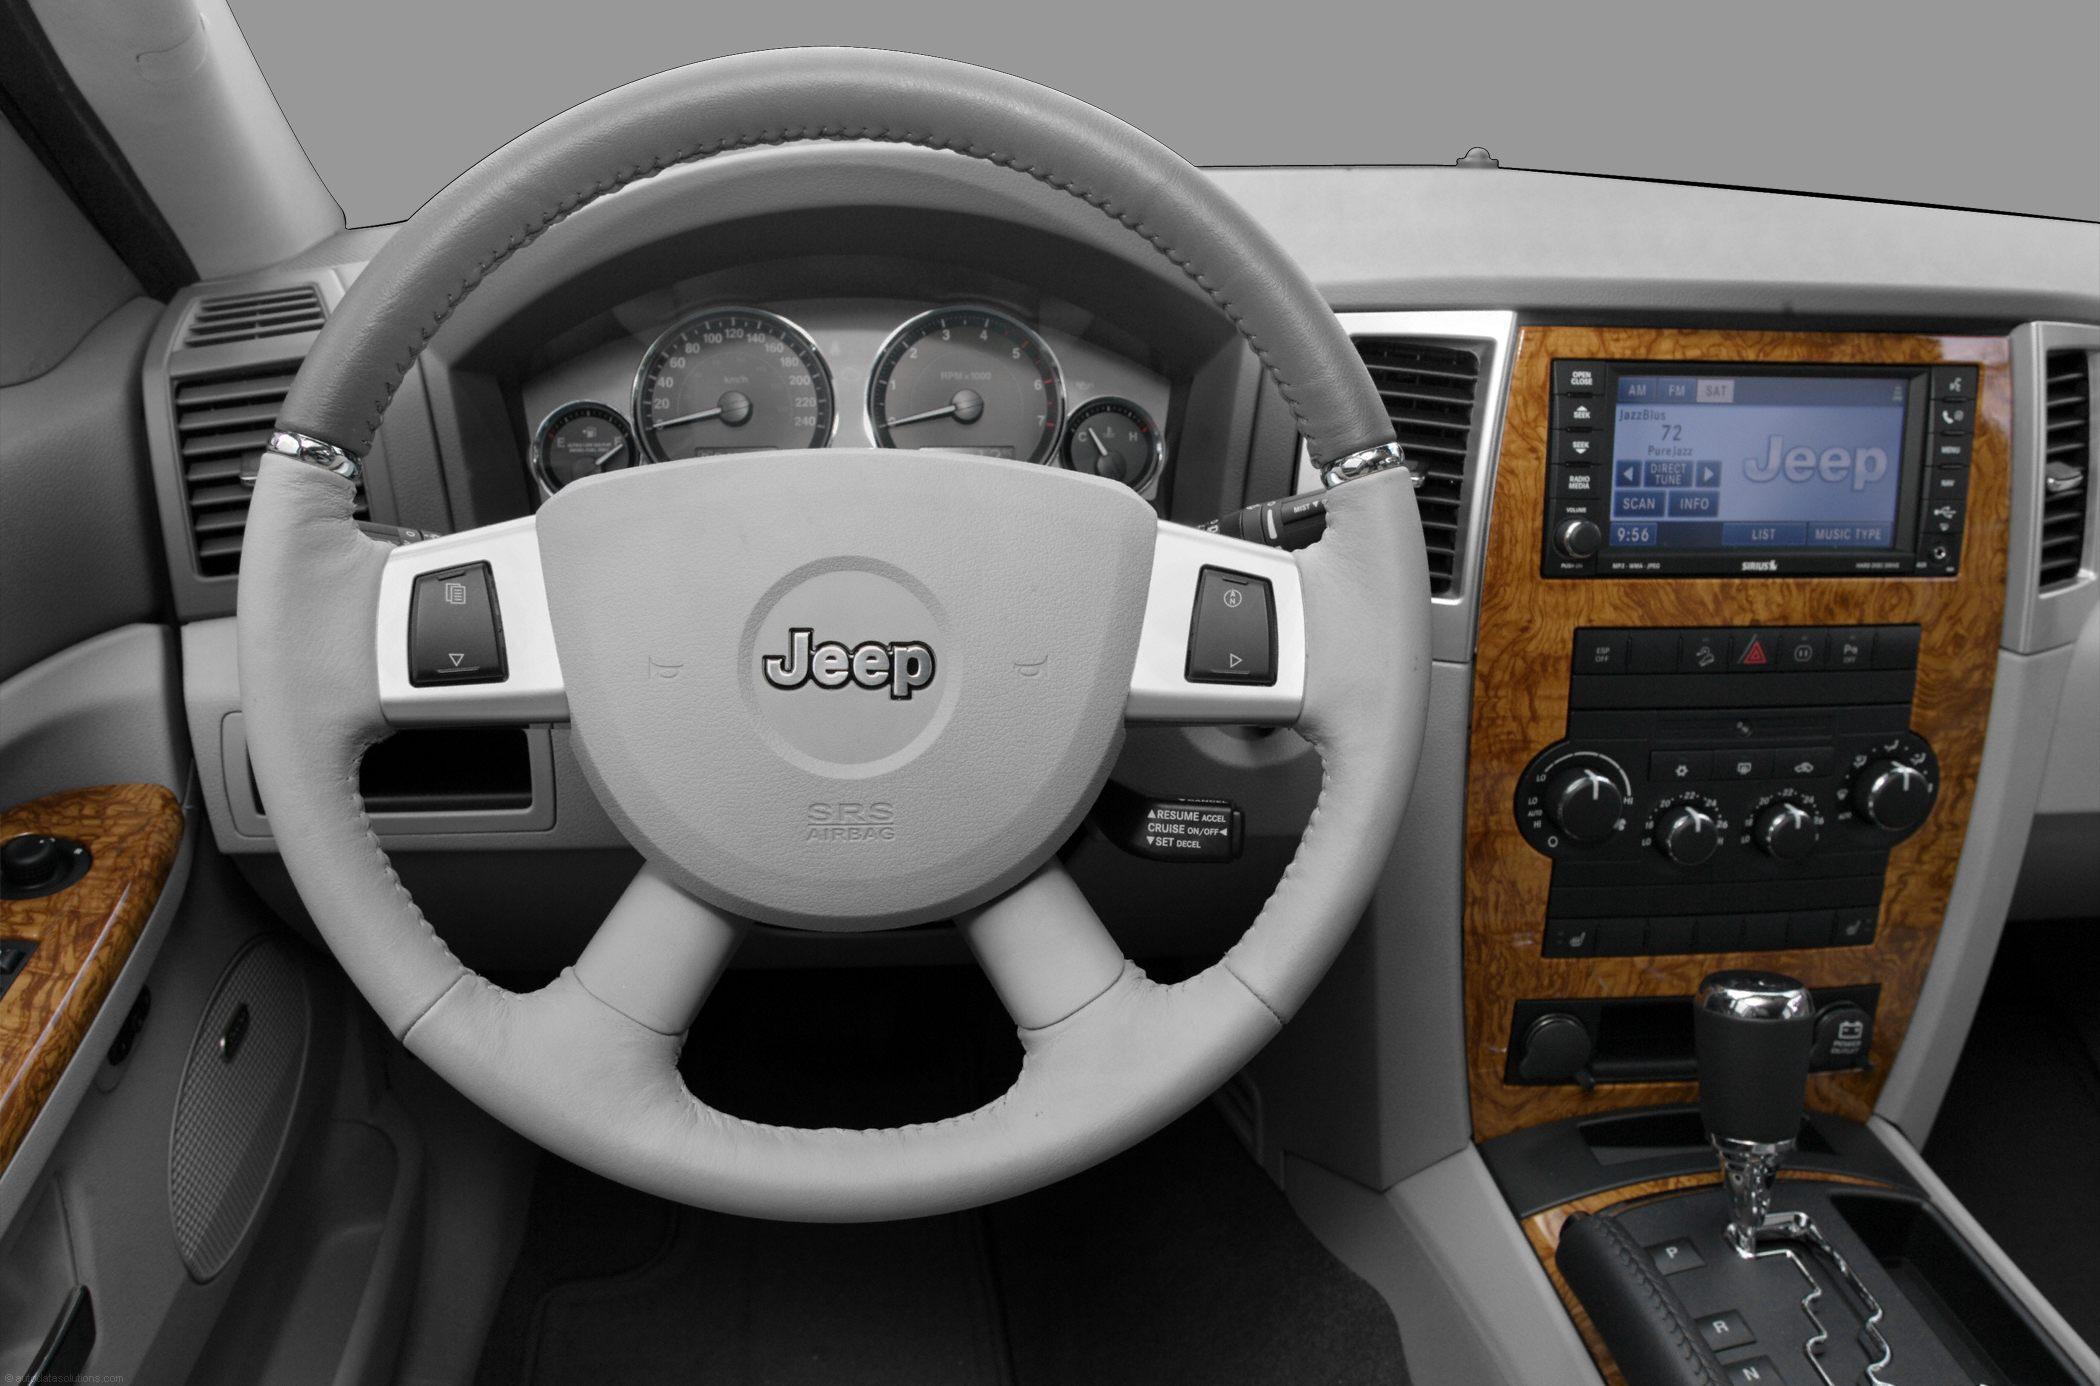 2010 Jeep Grand Cherokee #11 Jeep Grand Cherokee #11